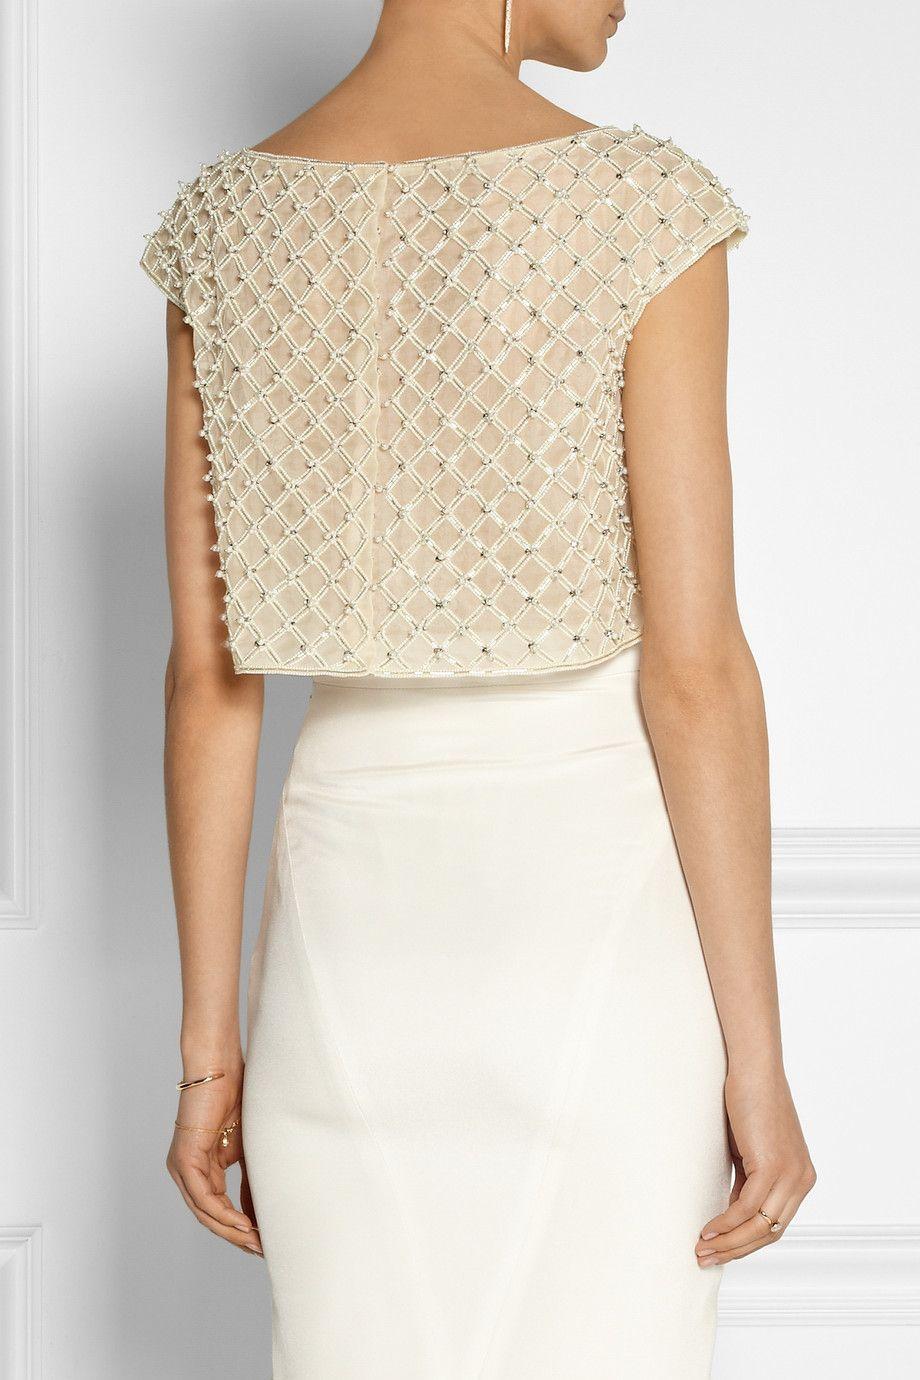 d8c0da1333835f Oscar De La Renta Cropped Embellished Organza Top in Beige (White) | Lyst